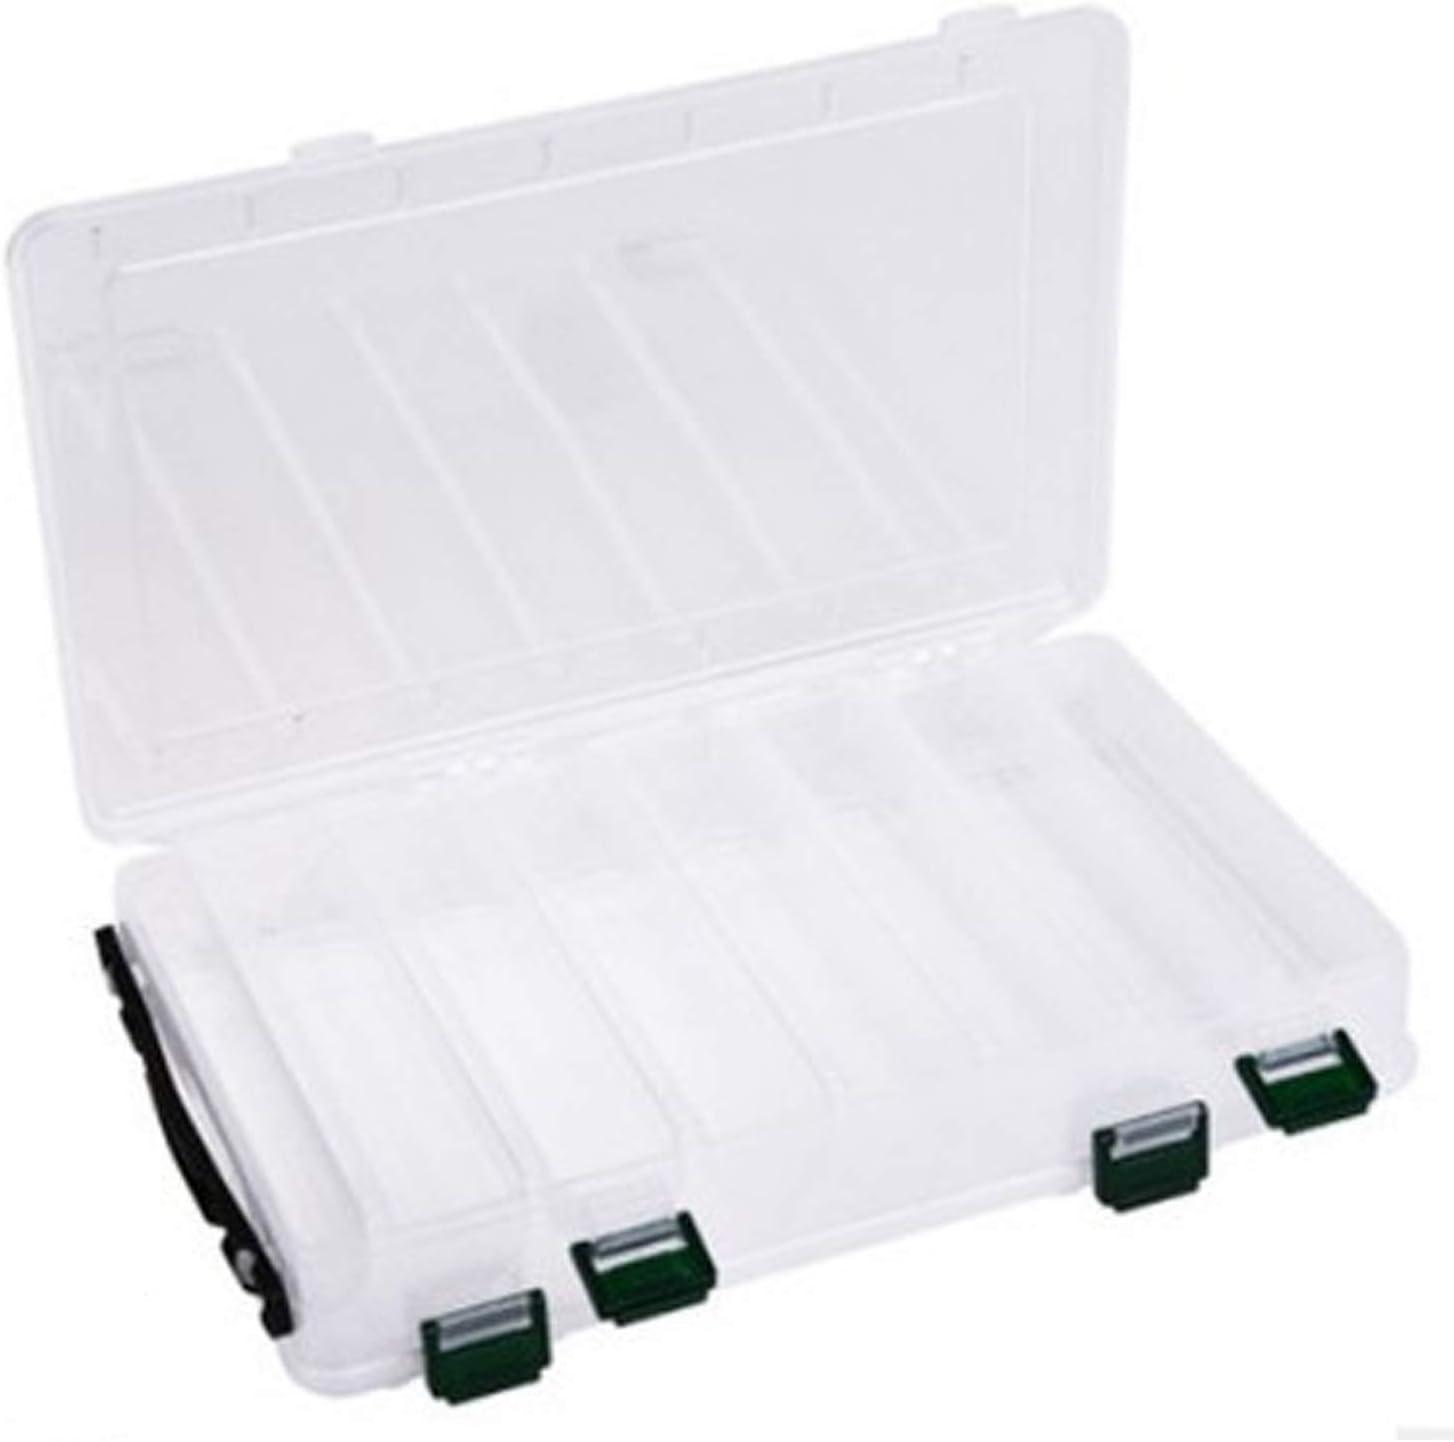 Haken K/öderbeh/älter K/öderbox f/ür Blinker /& Wobbler Hardbaits Box Kunststoff Tackle Box, 16 /× 7,7 /× 4,5 cm f/ür Kunstk/öder 16 Faecher wasserdichte Angel Box Angelbox f/ür Angelk/öder Baitbox